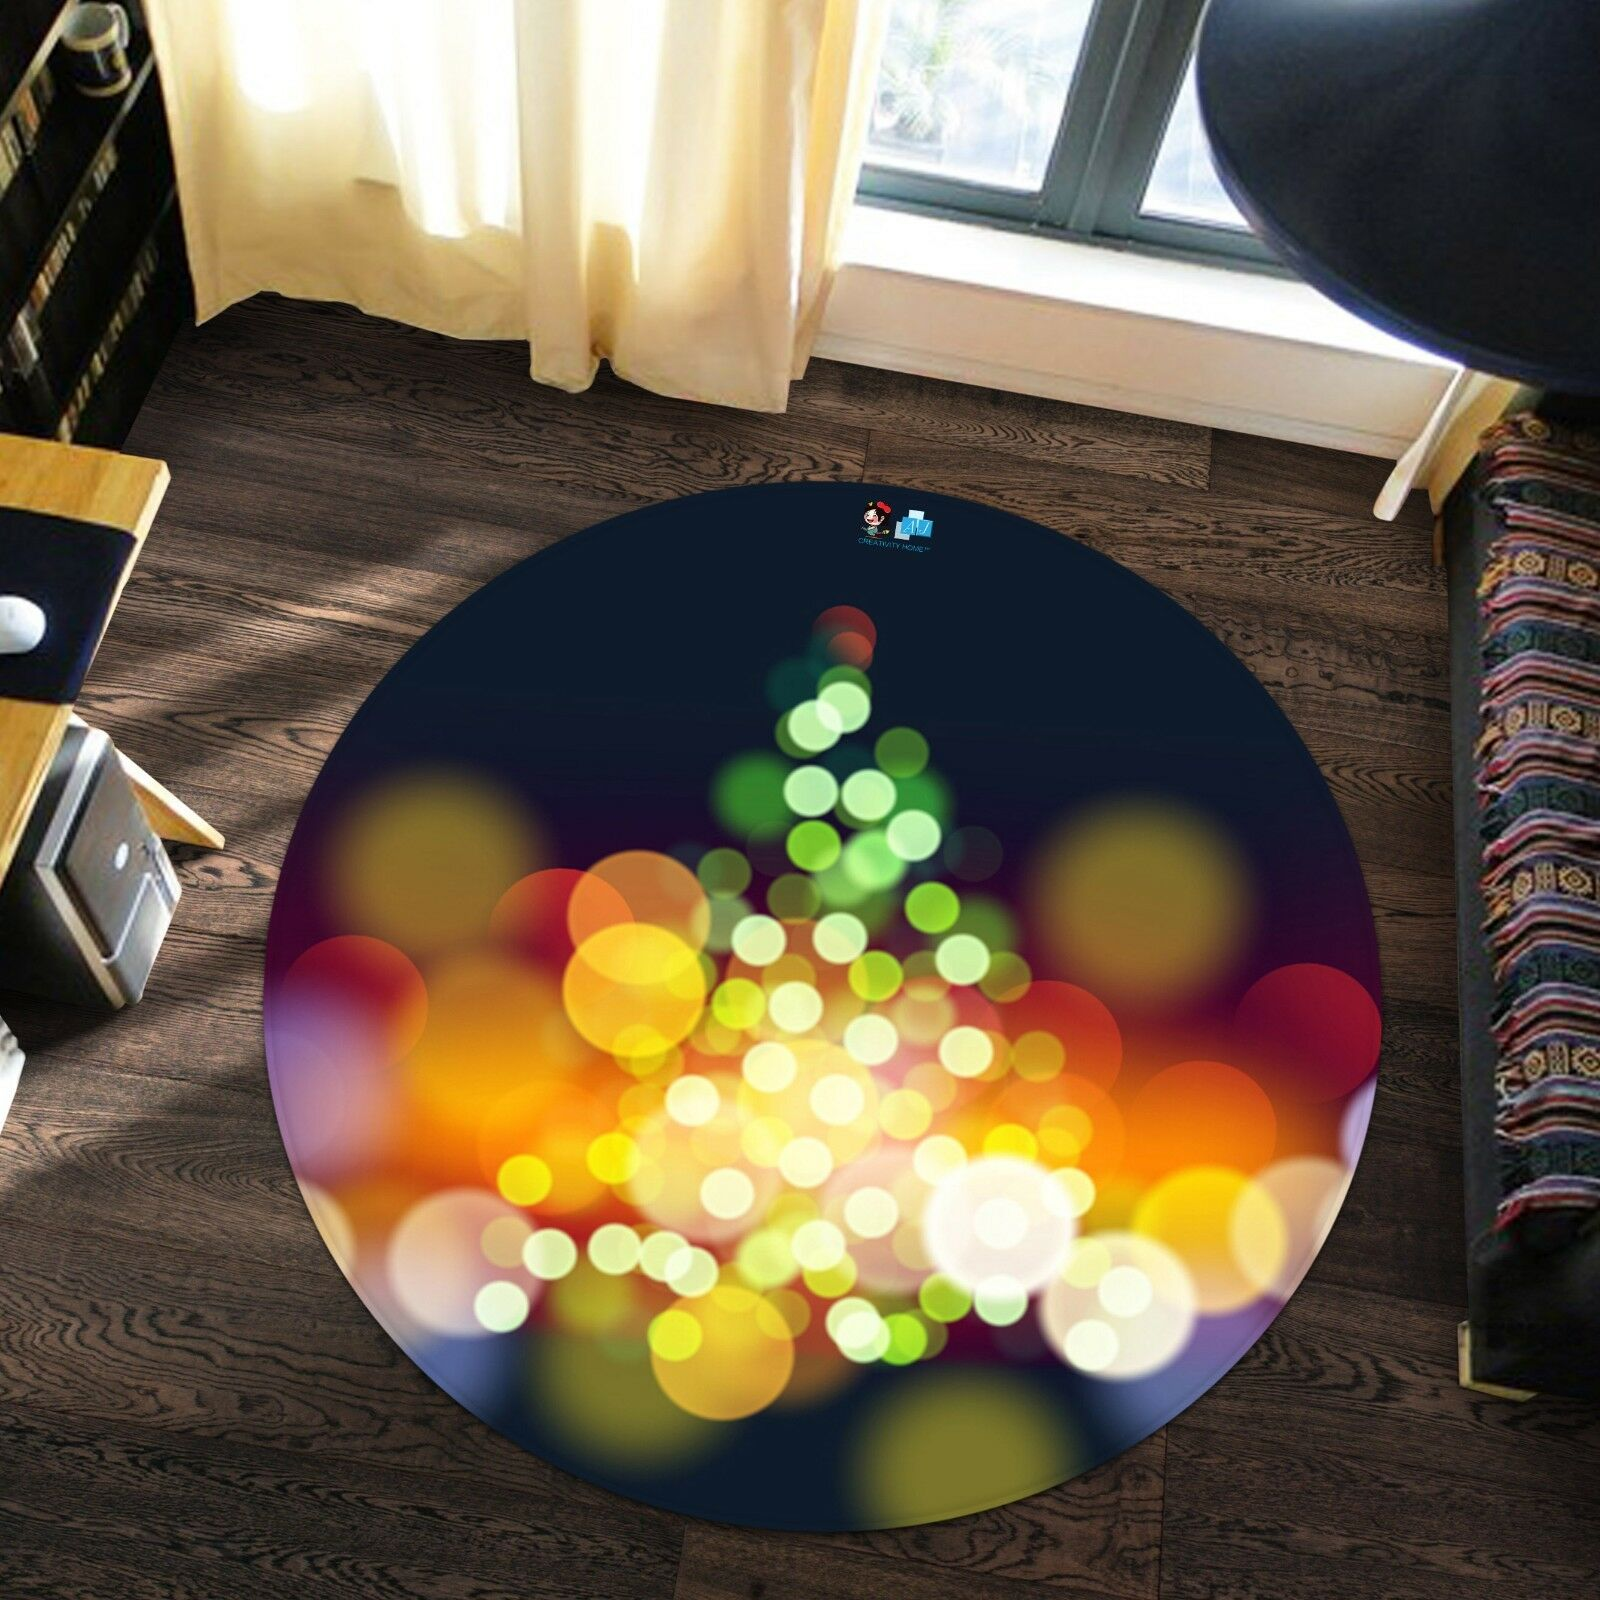 3D Christmas Xmas 722 Non Slip Rug Room Mat Round Quality elegant photo carpet